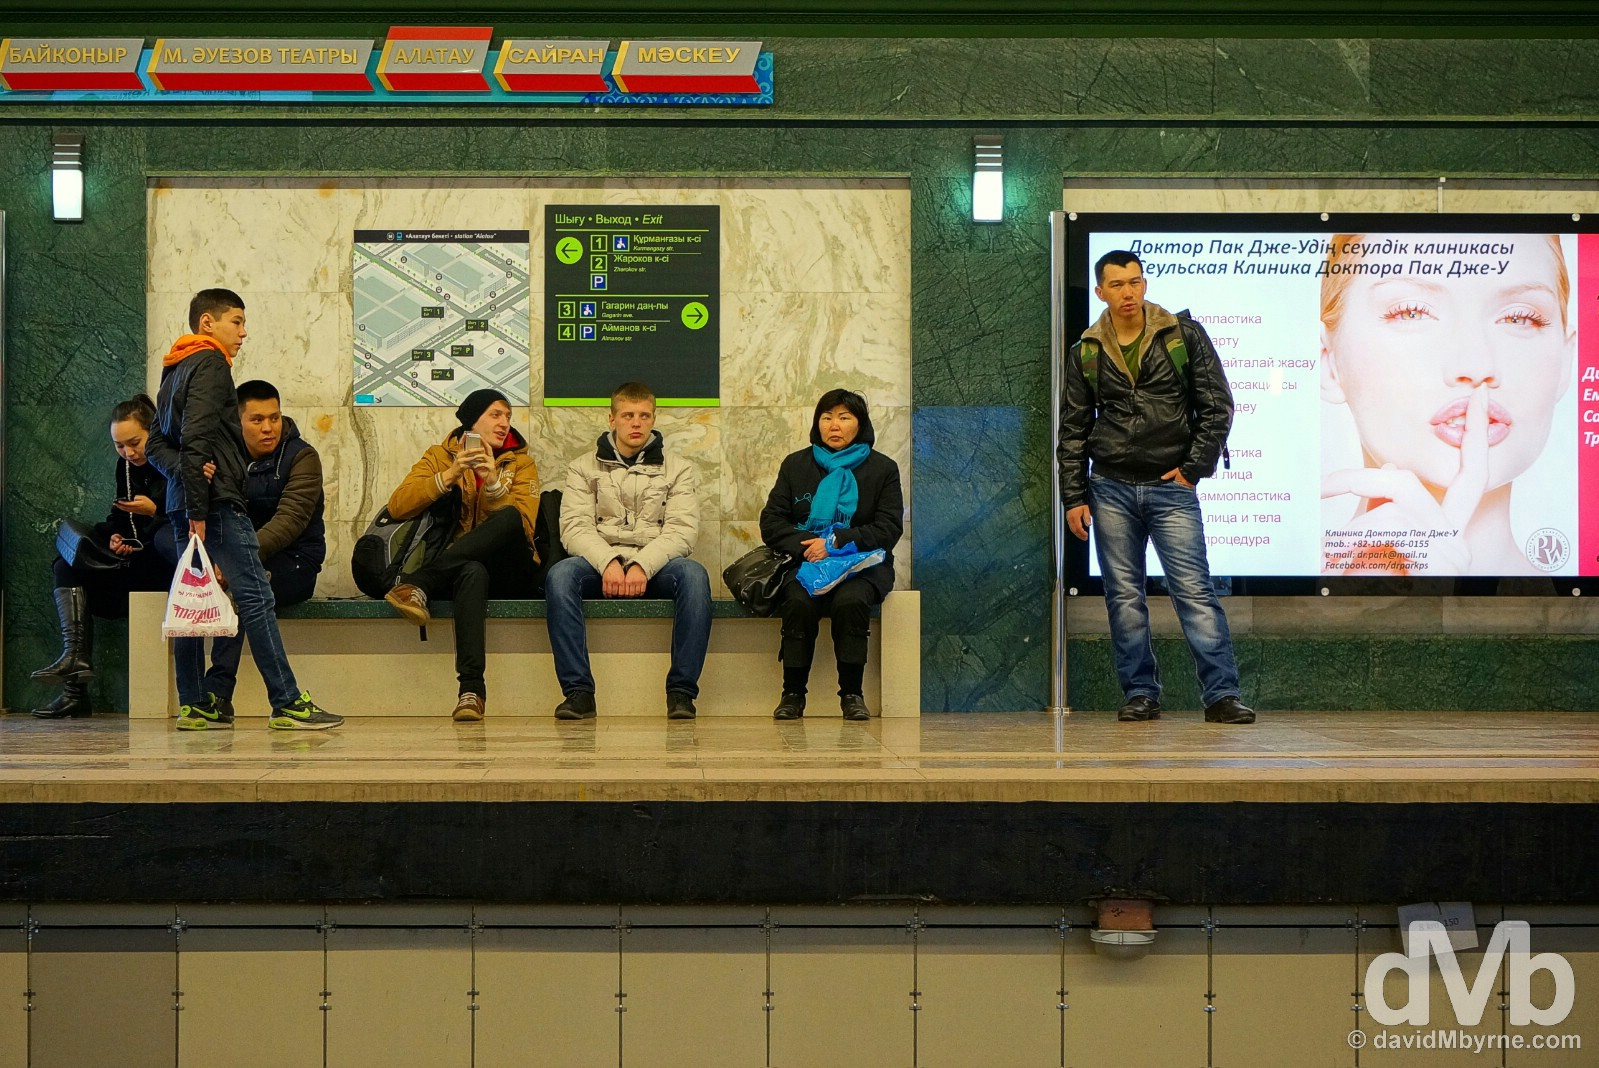 Waiting on the platform of Alatau Metro Station in Almaty, Kazakhstan. February 21, 2015.